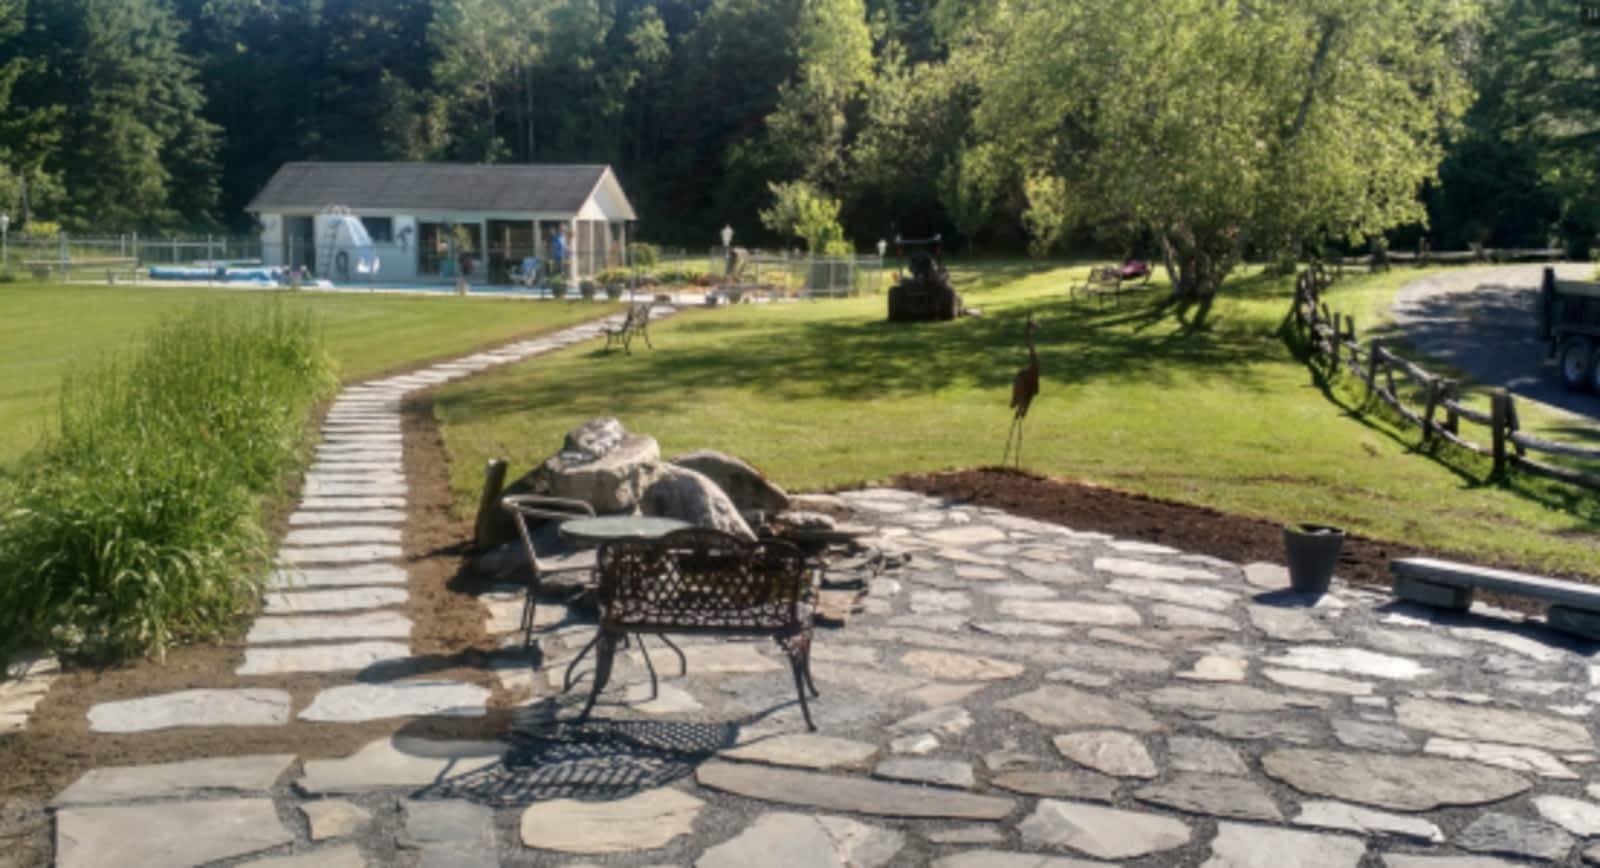 paysagiste nantes avis diaporama accueil paysagiste vannes jardins vannes pilier hortensia. Black Bedroom Furniture Sets. Home Design Ideas